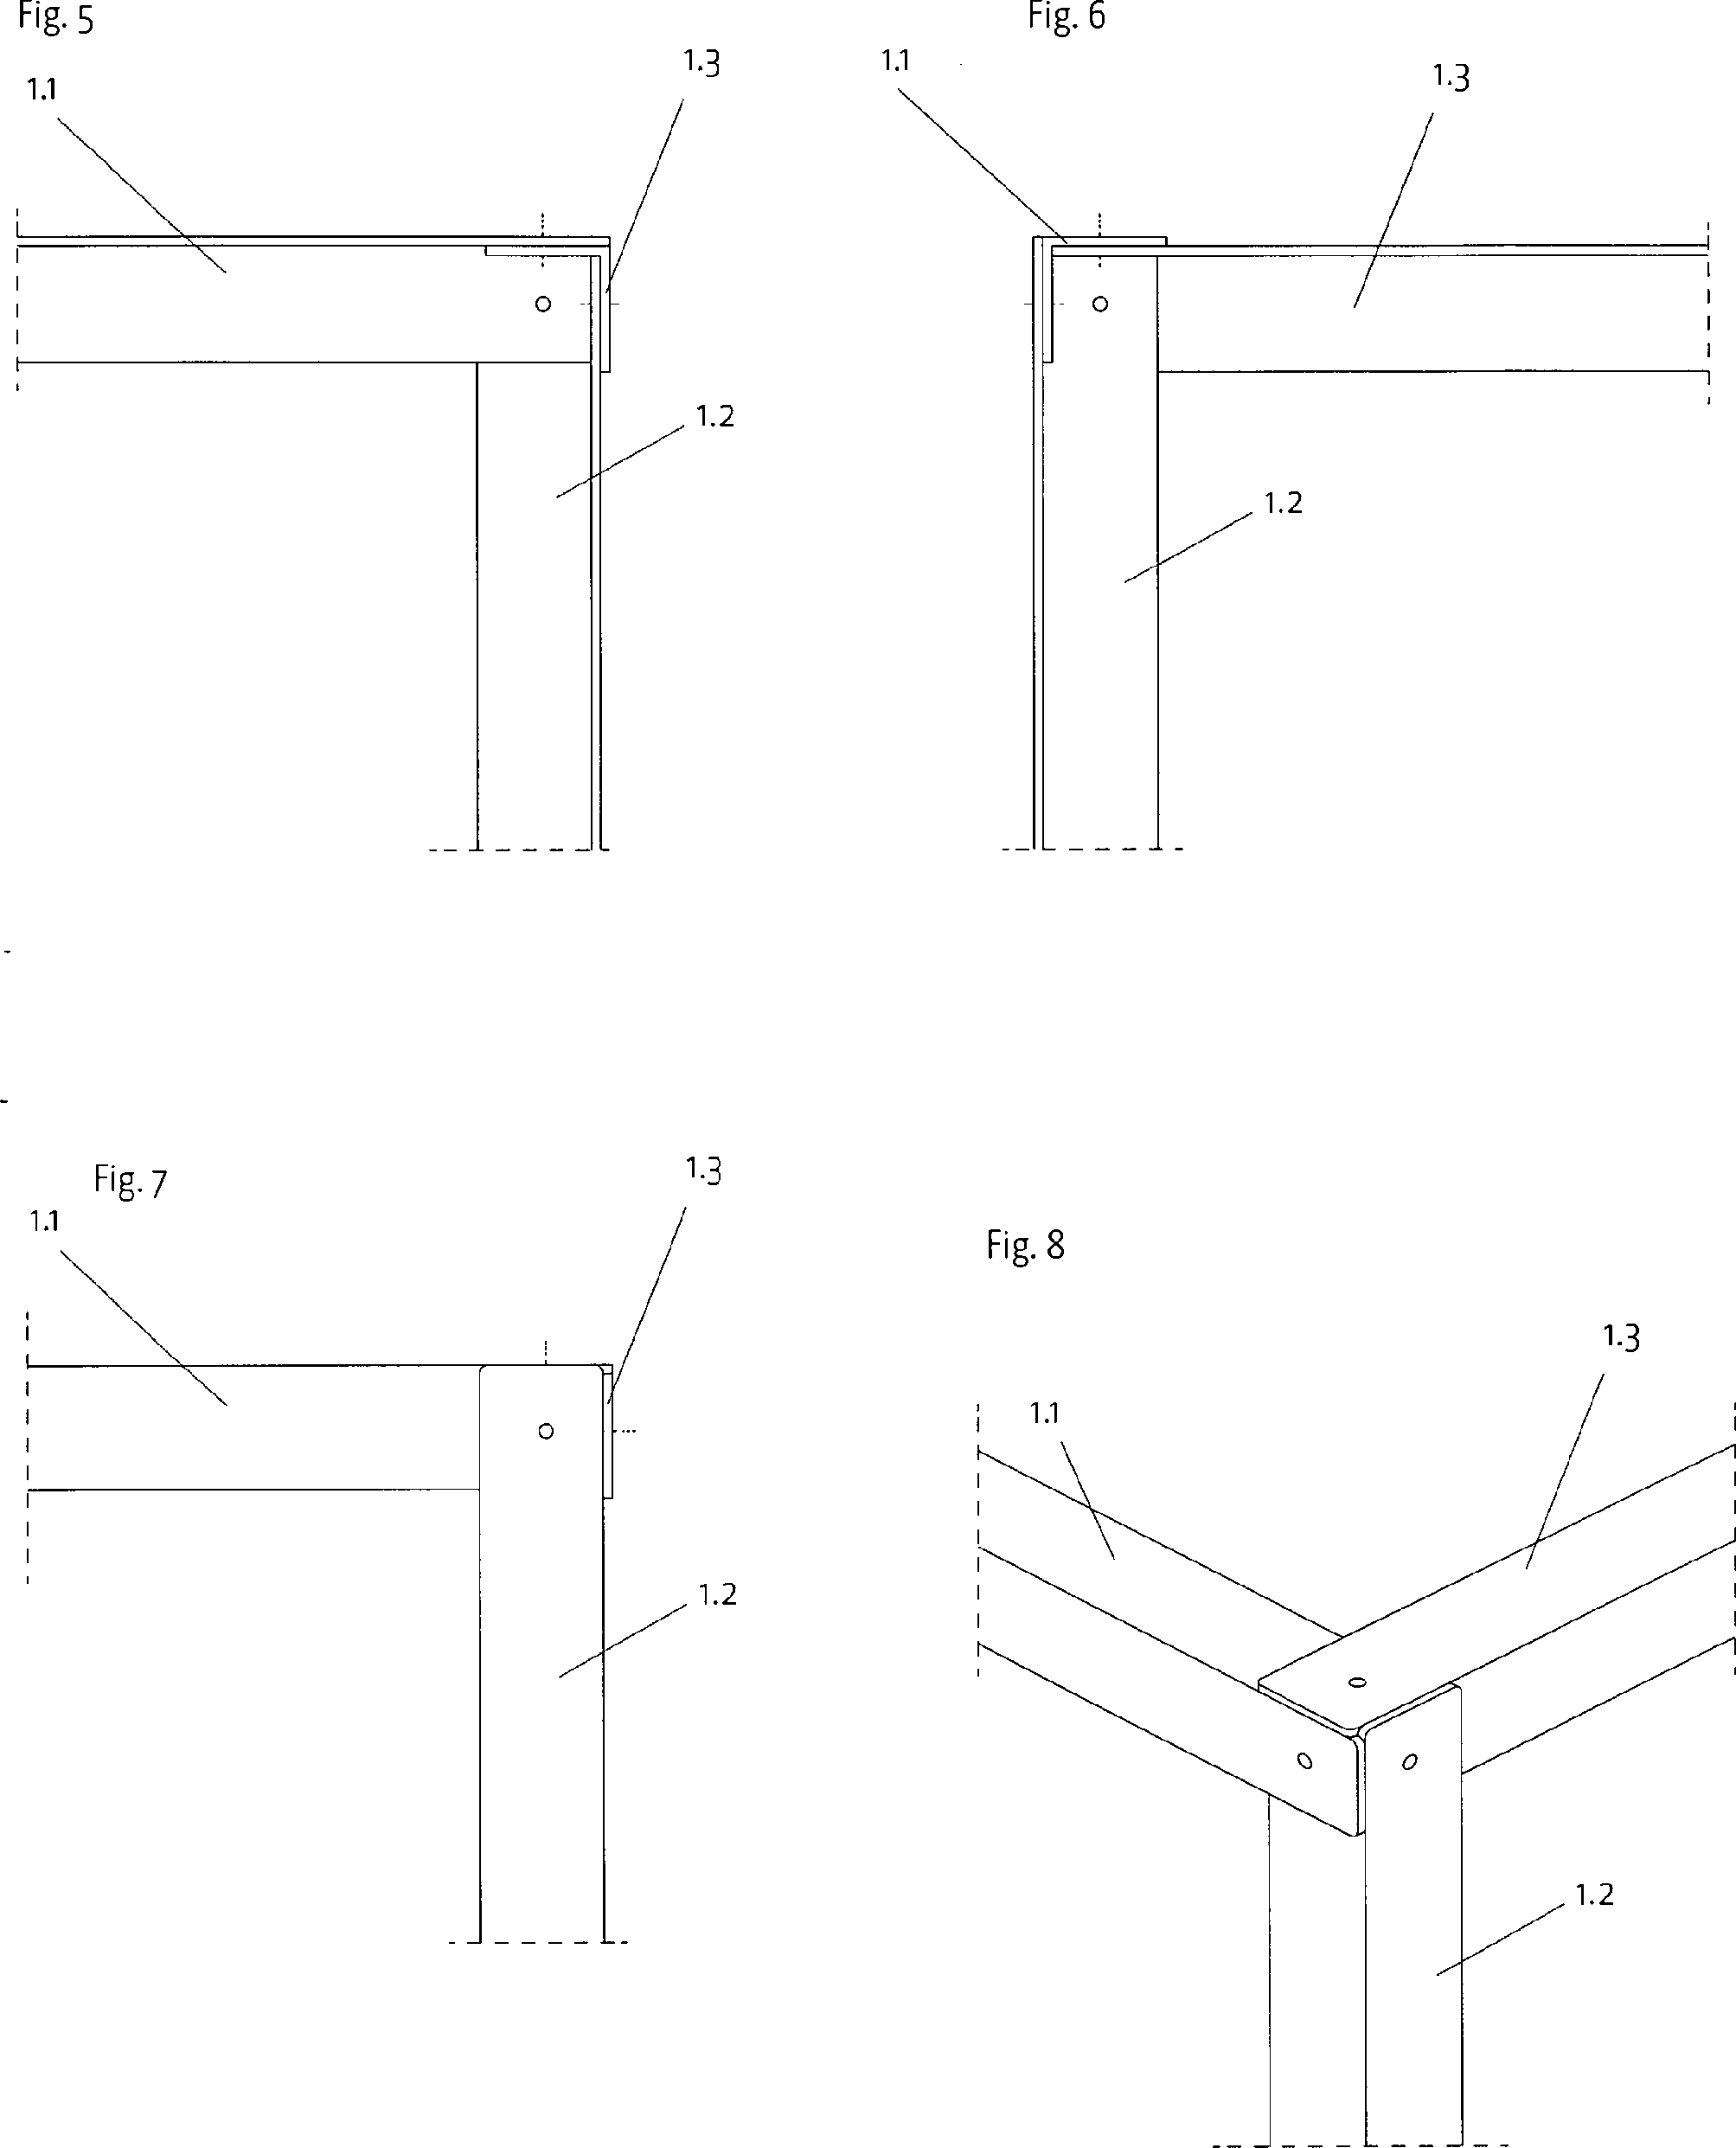 ZimmertUren Holz Oder Kunststoff ~   für L Profile aus Metall, Holz oder Kunststoff  Google Patents